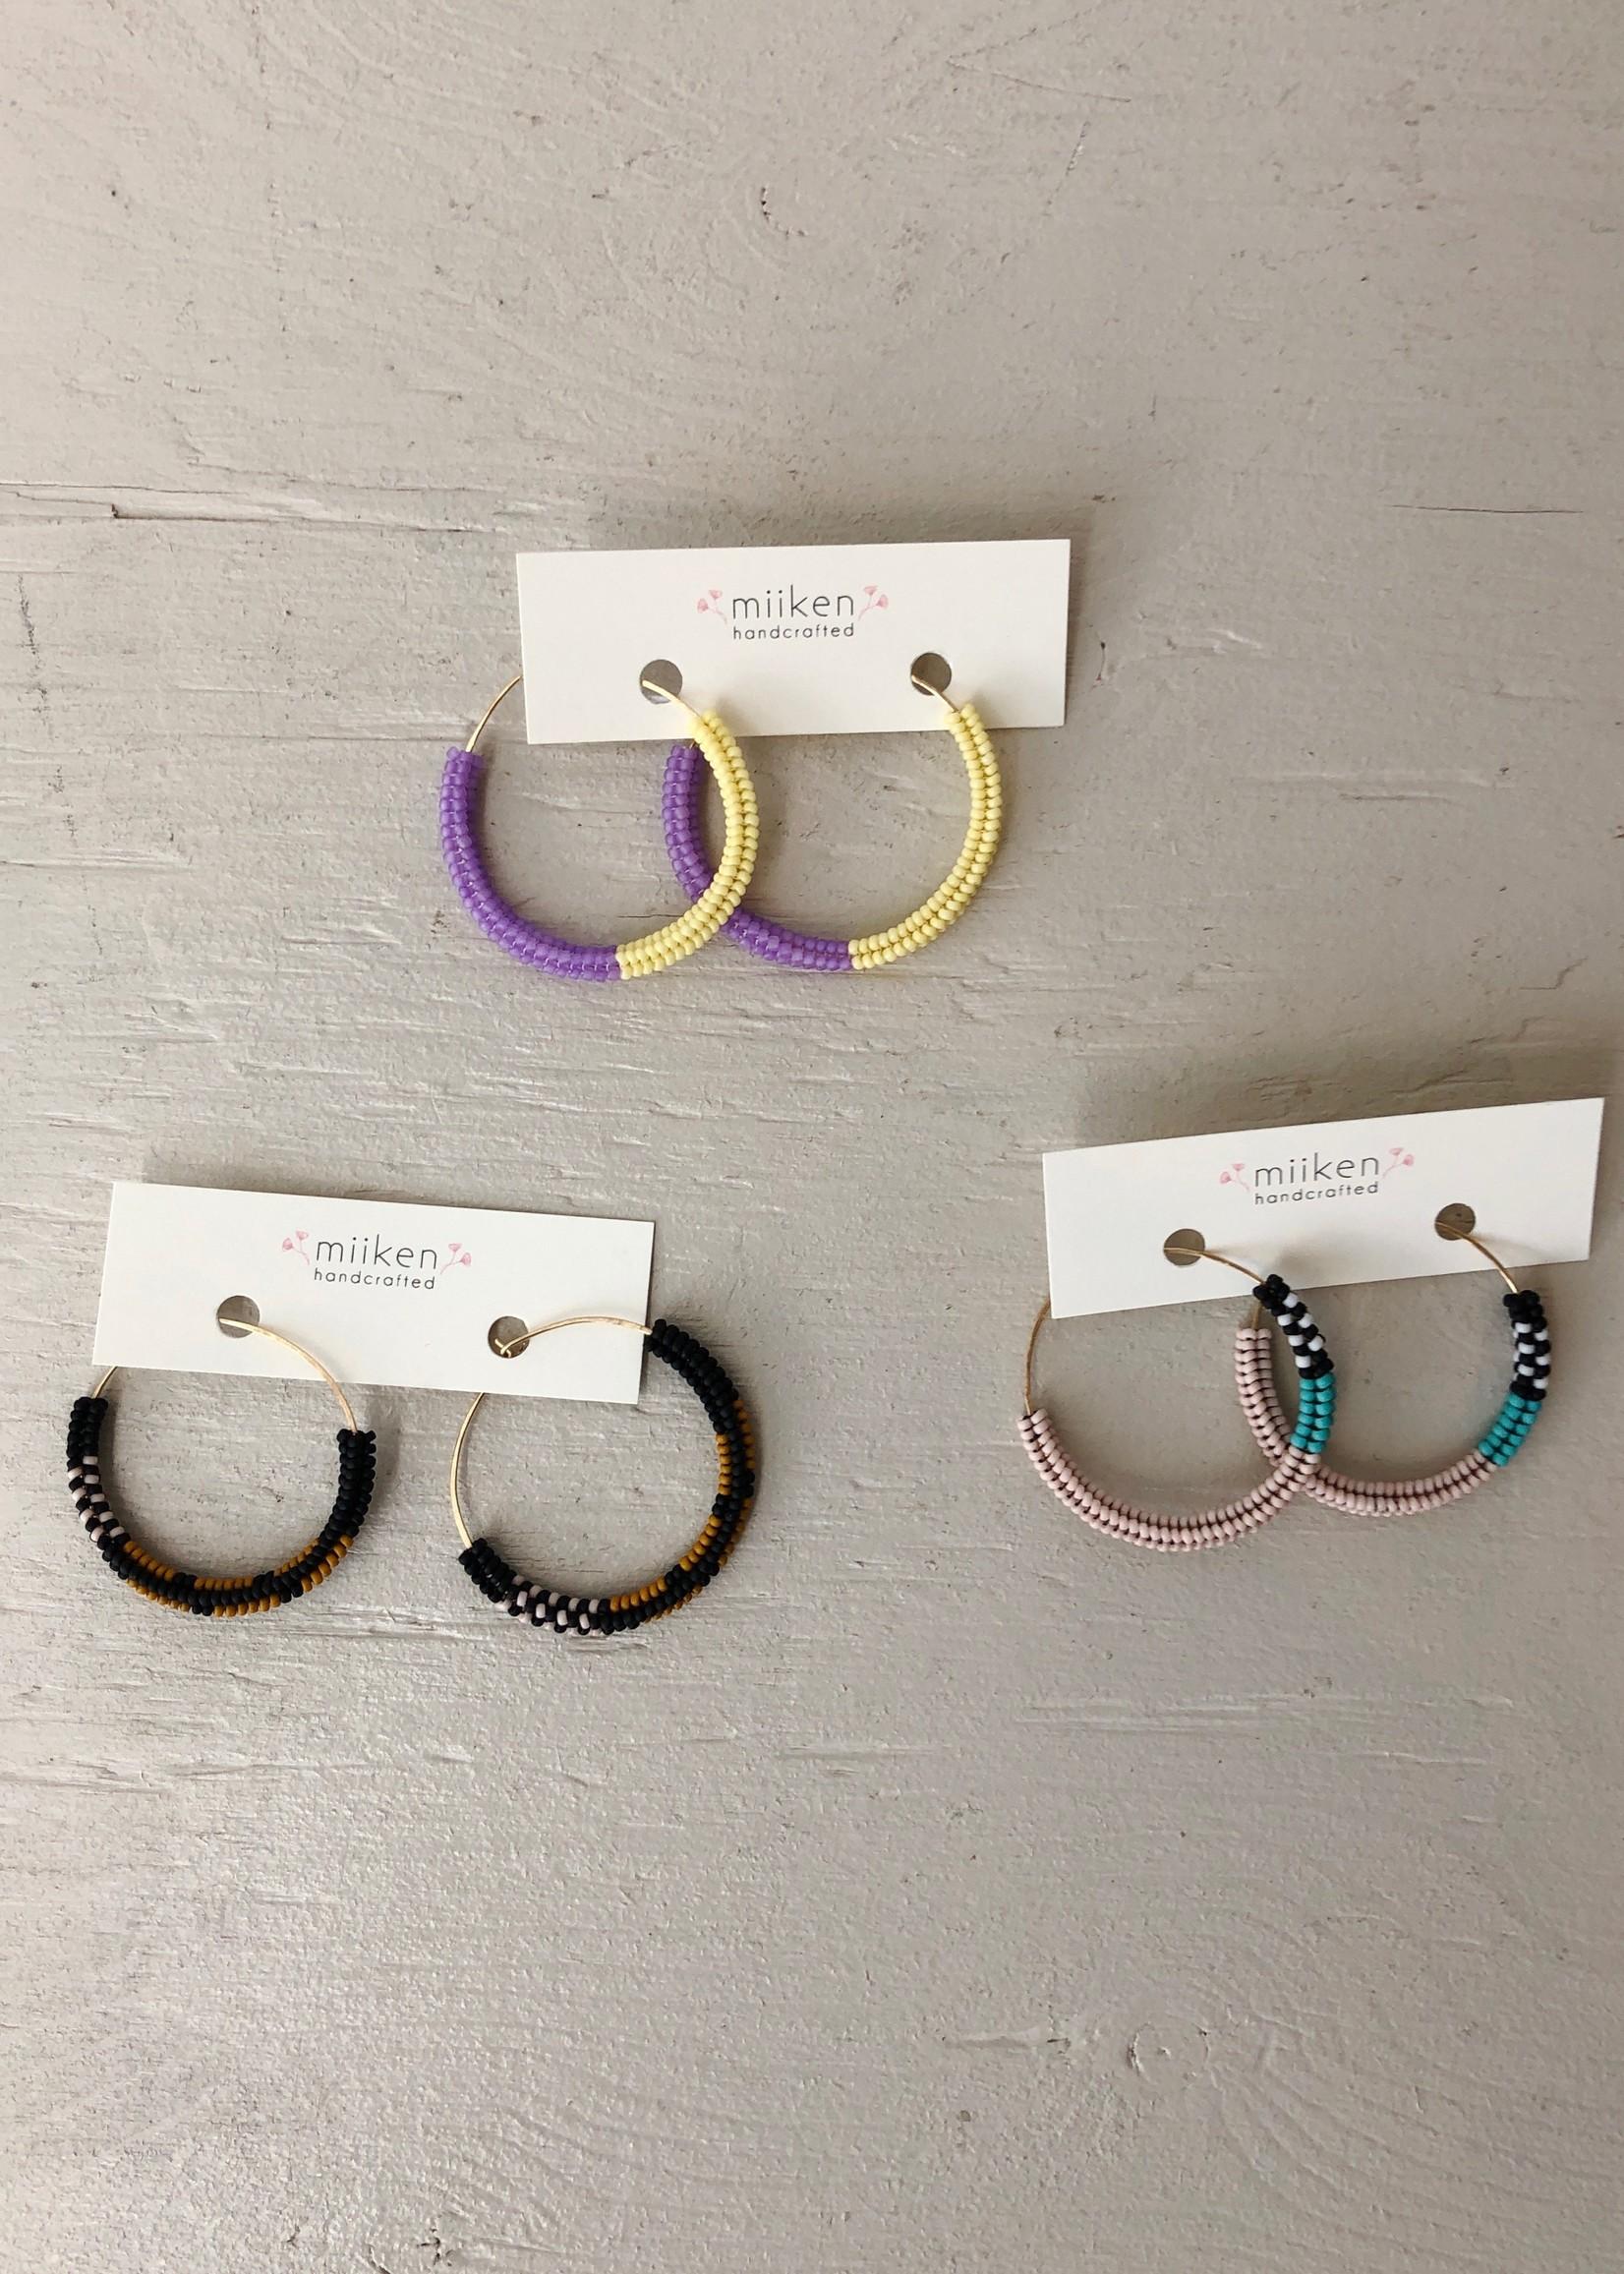 Miiken Handcrafted Hoops Earrings by Miiken Handcrafted